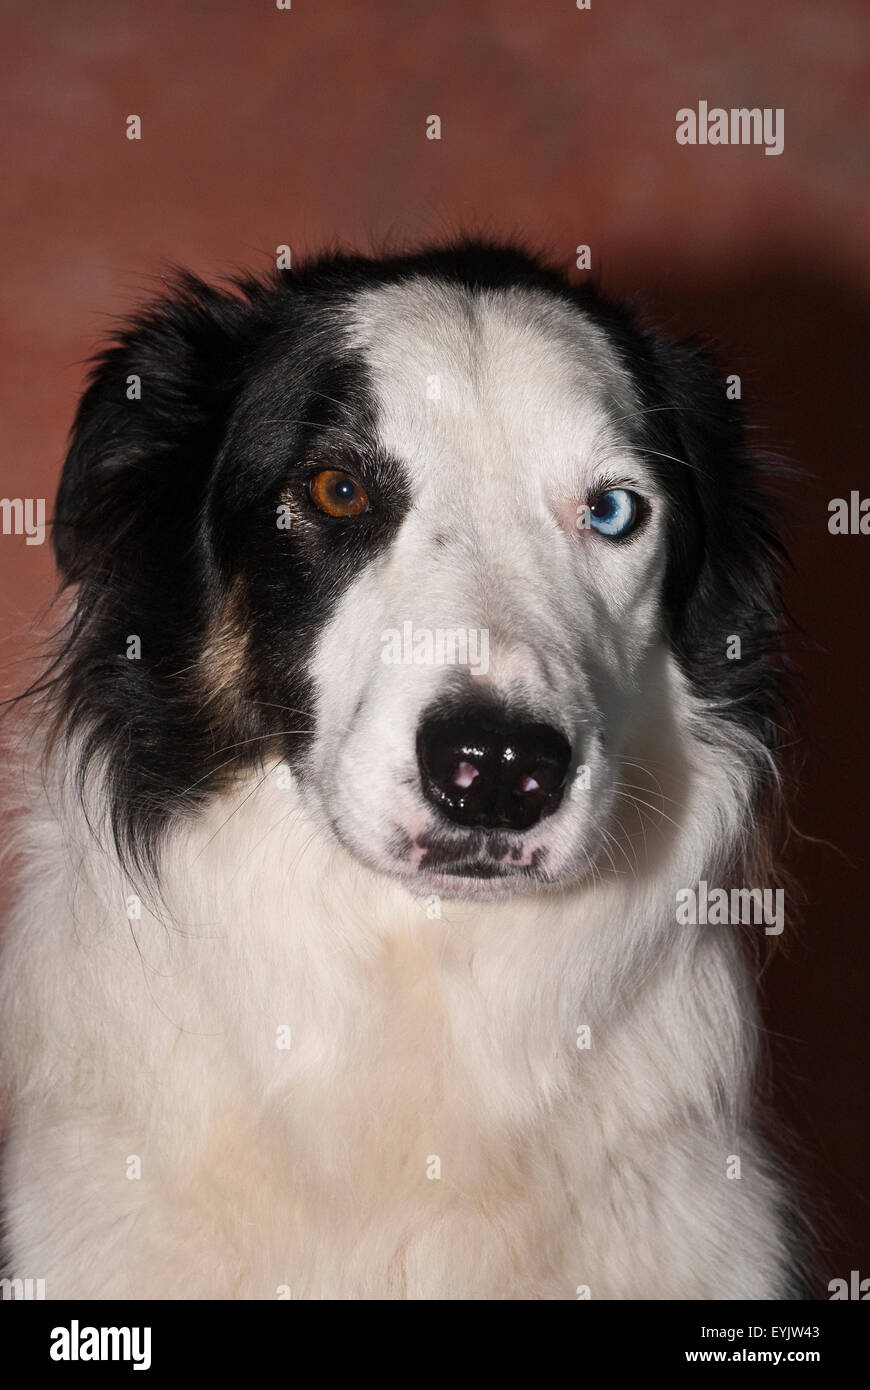 border collie sheep dog in photographers studio - Stock Image